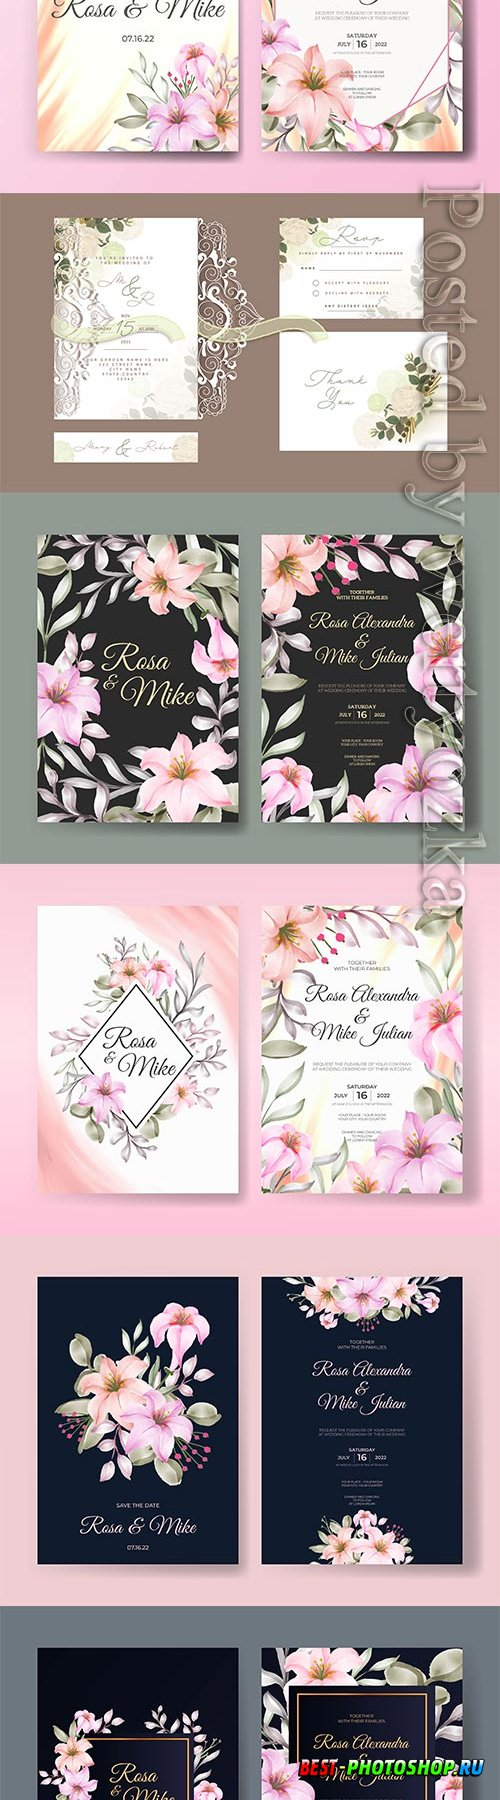 Wedding card set with beautiful design